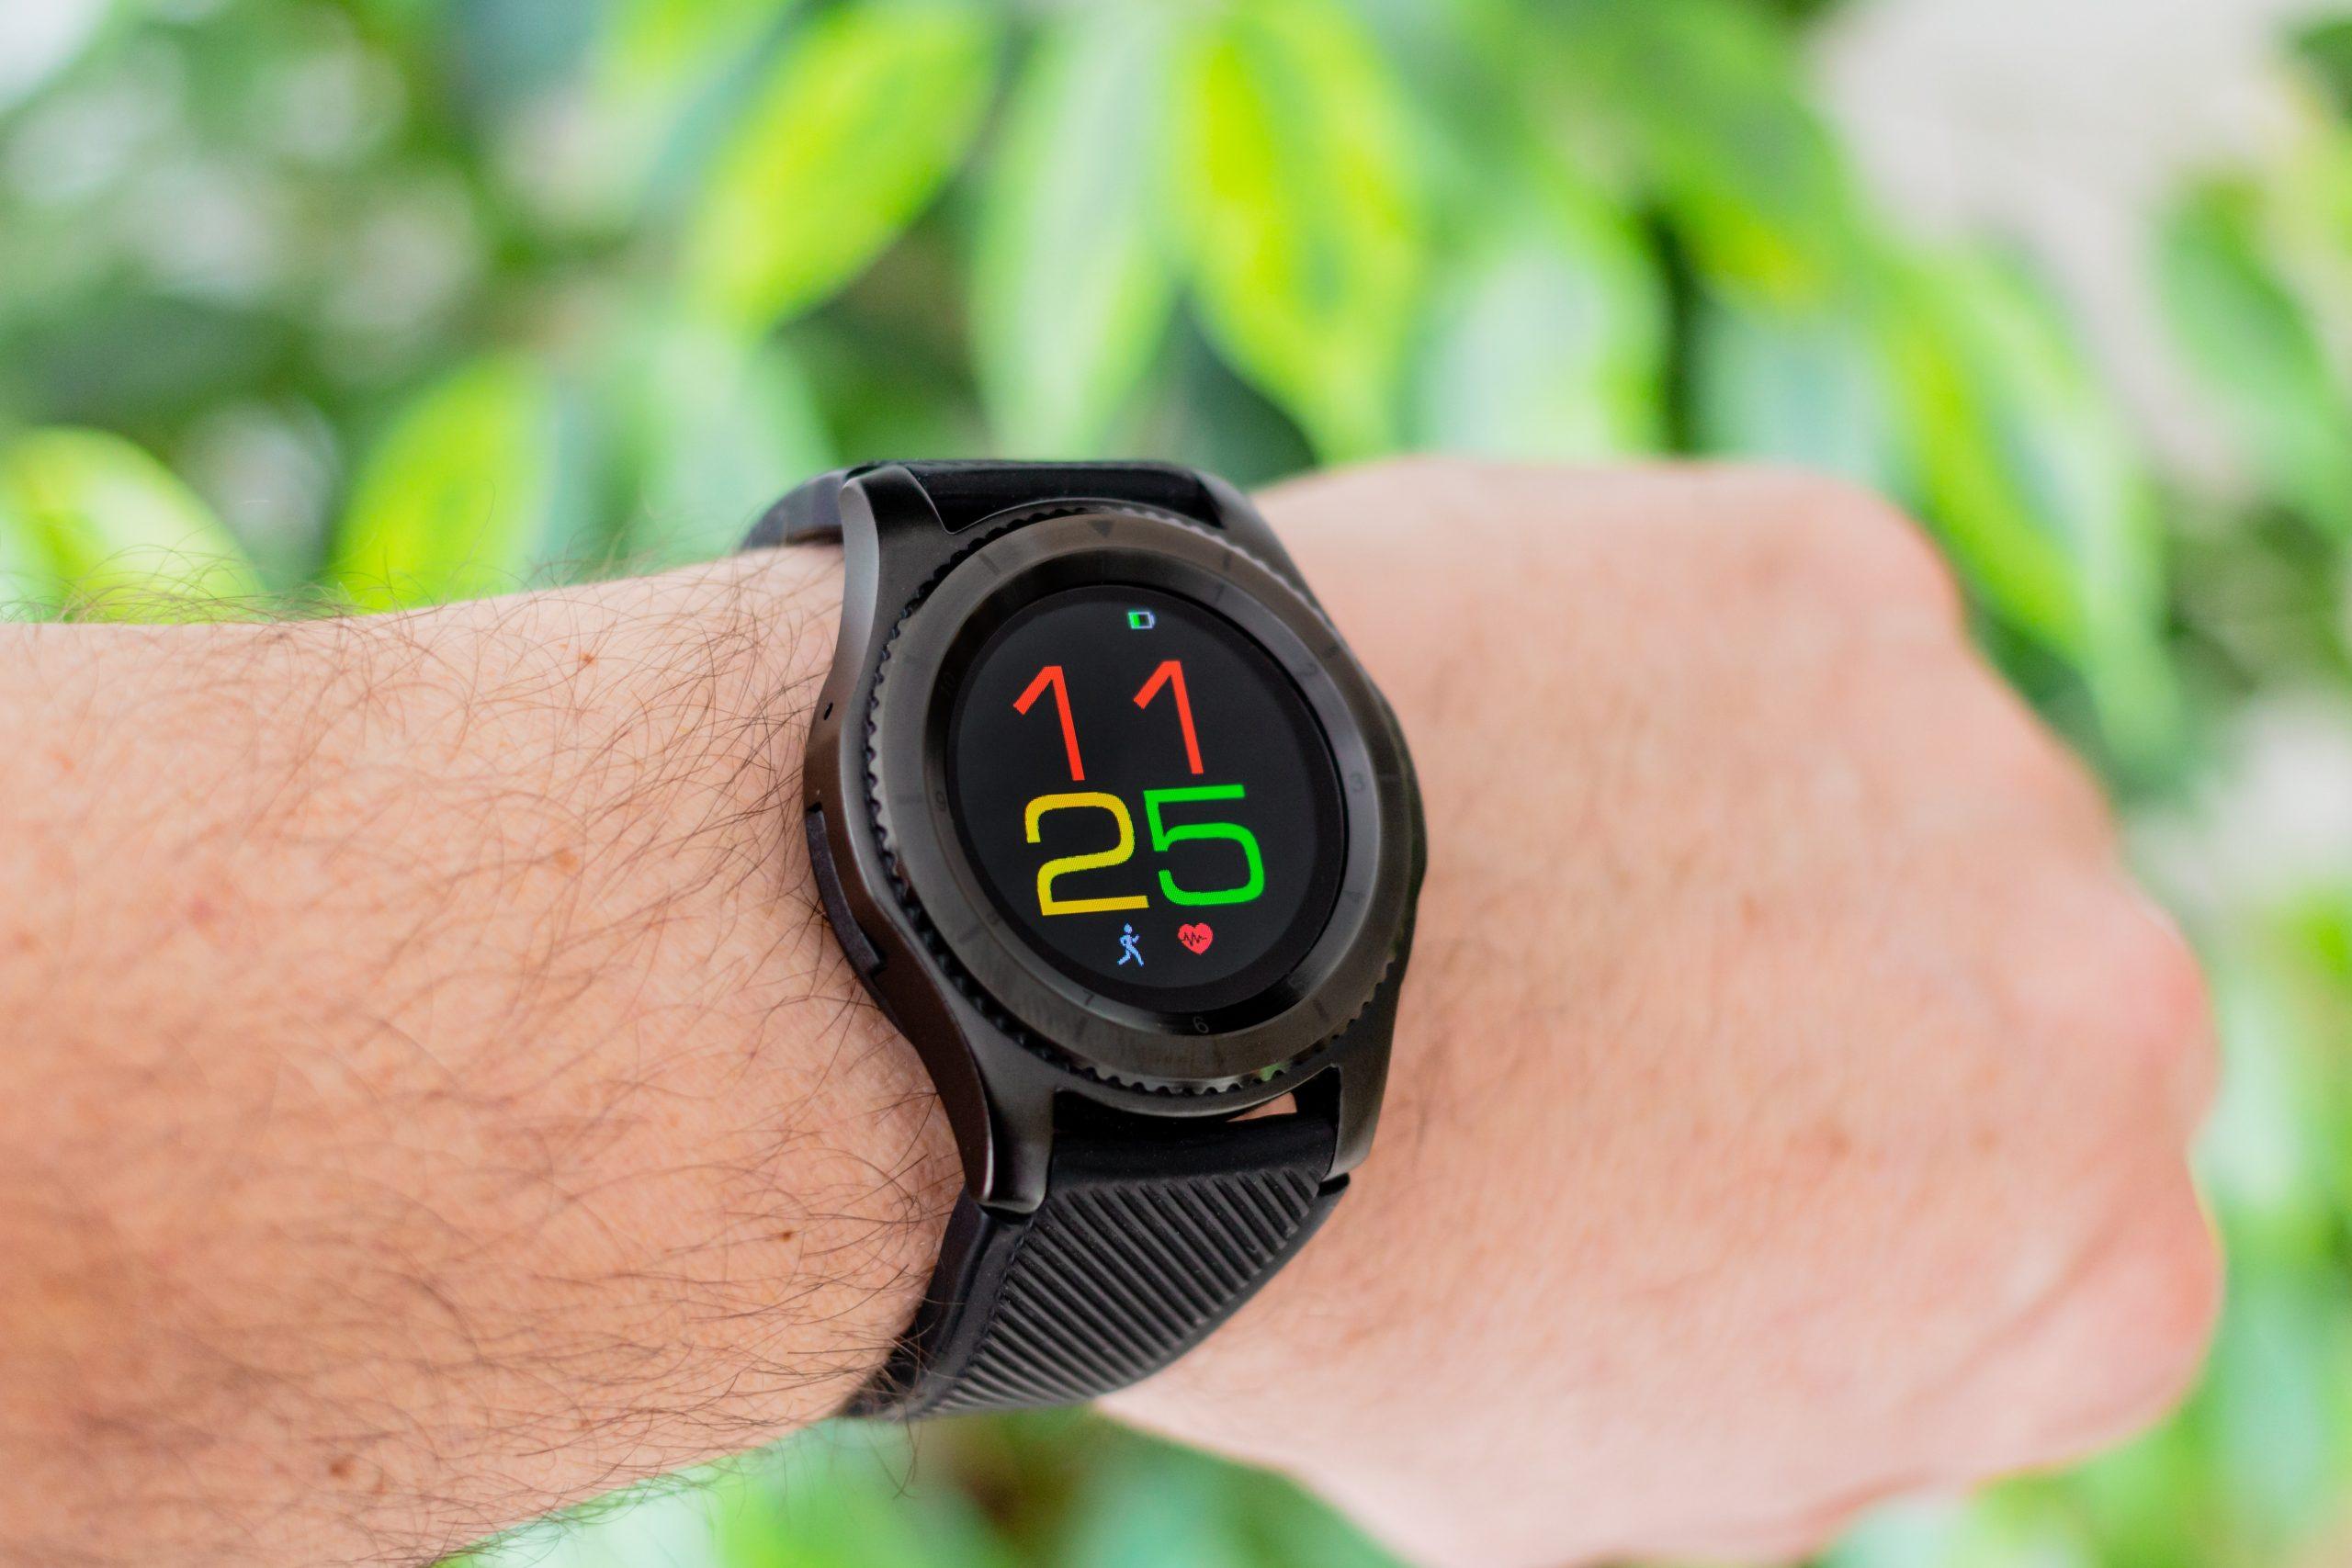 Uno smartwatch Android al polso